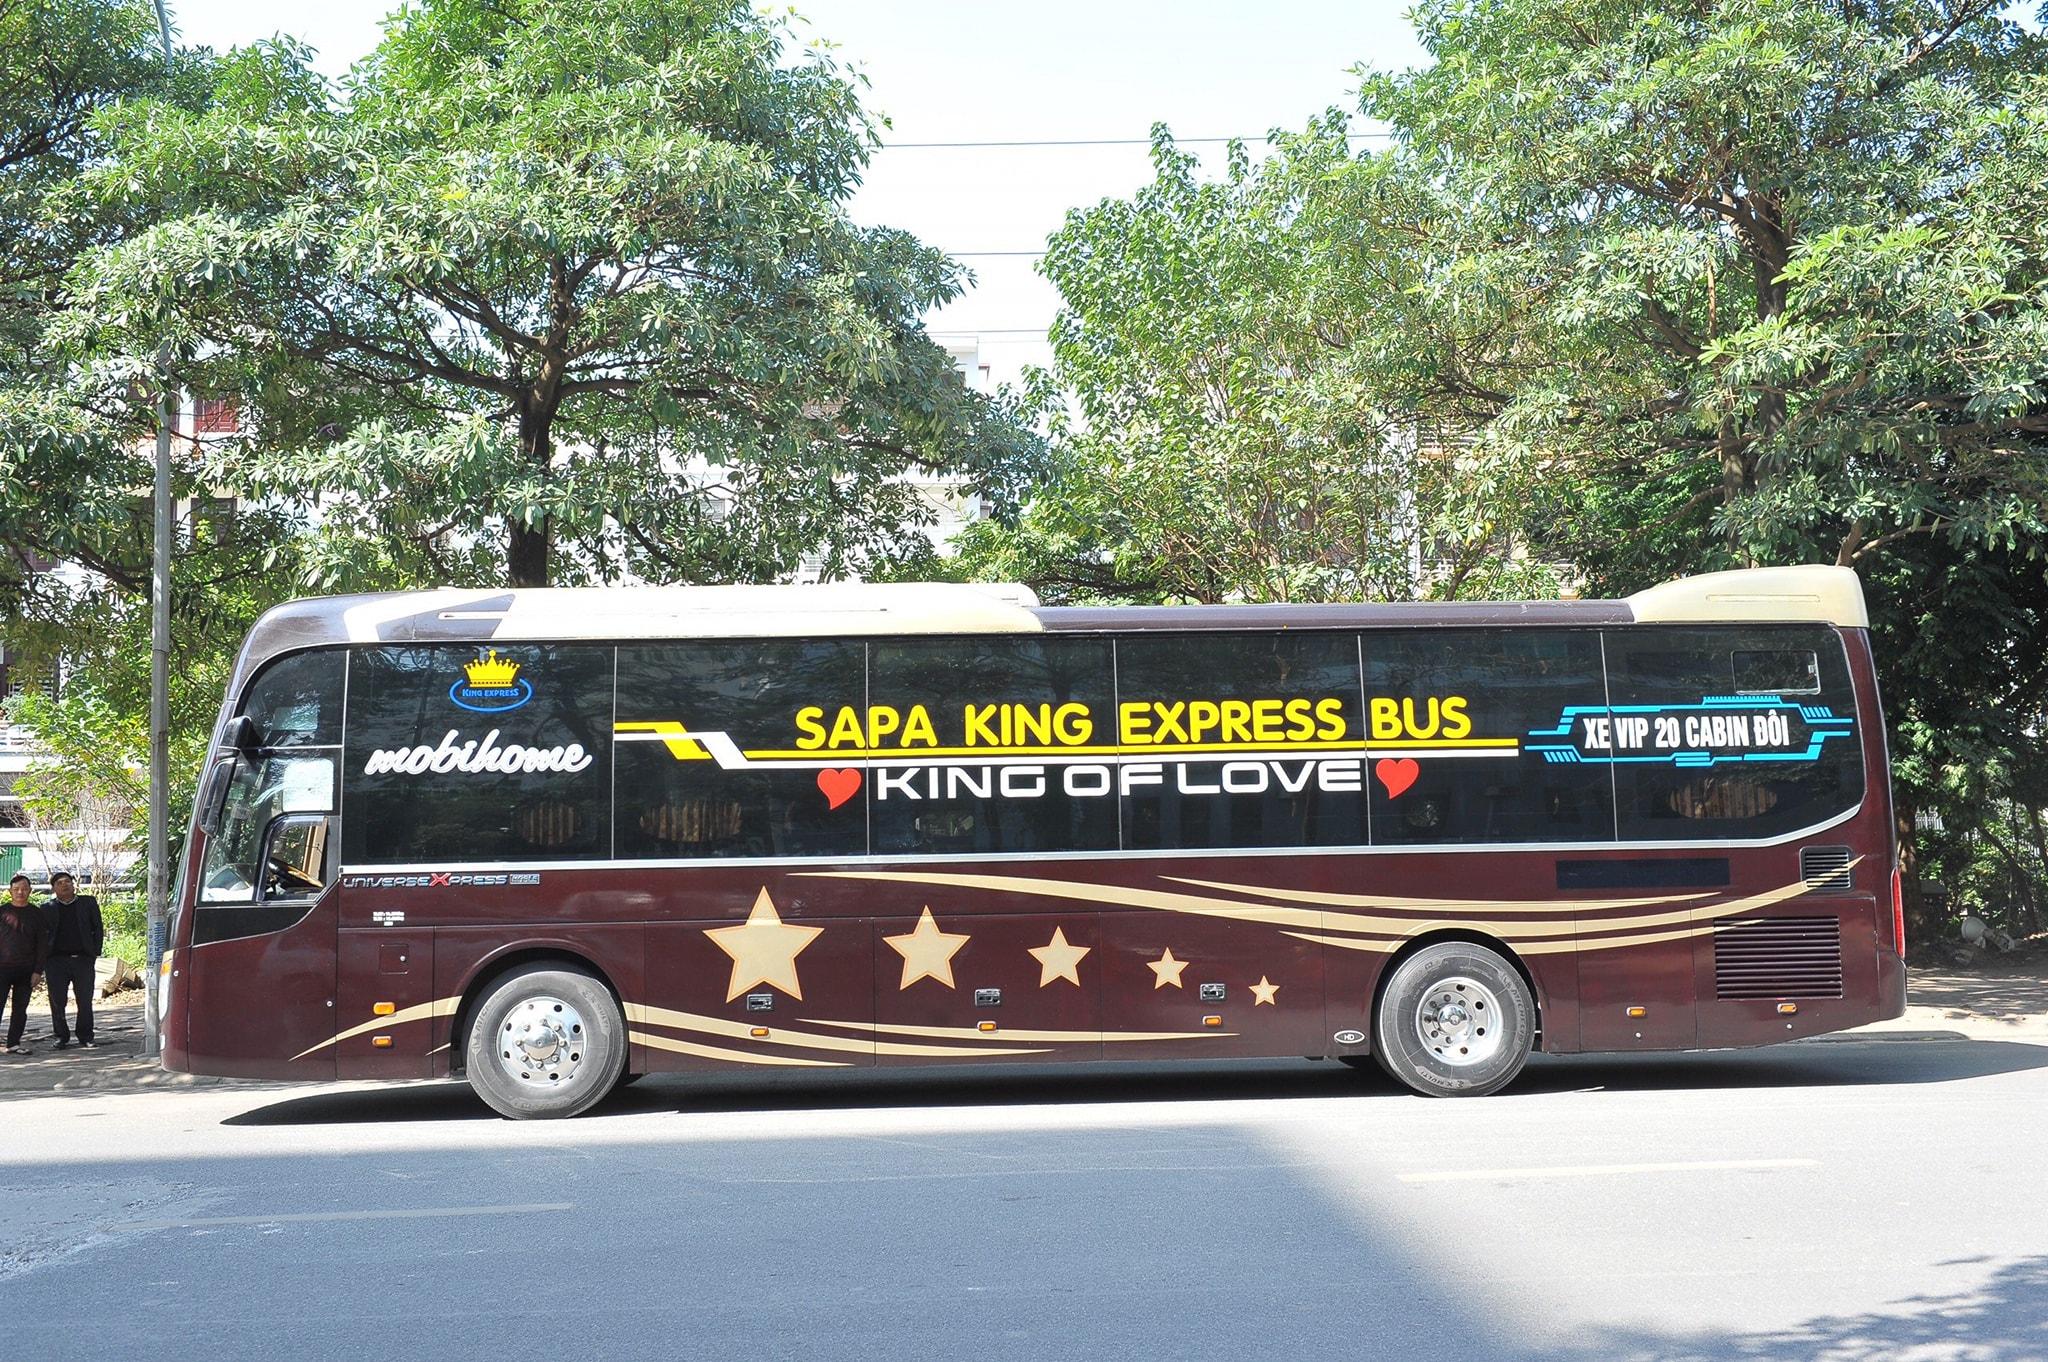 Hãng xe Sapa King Express